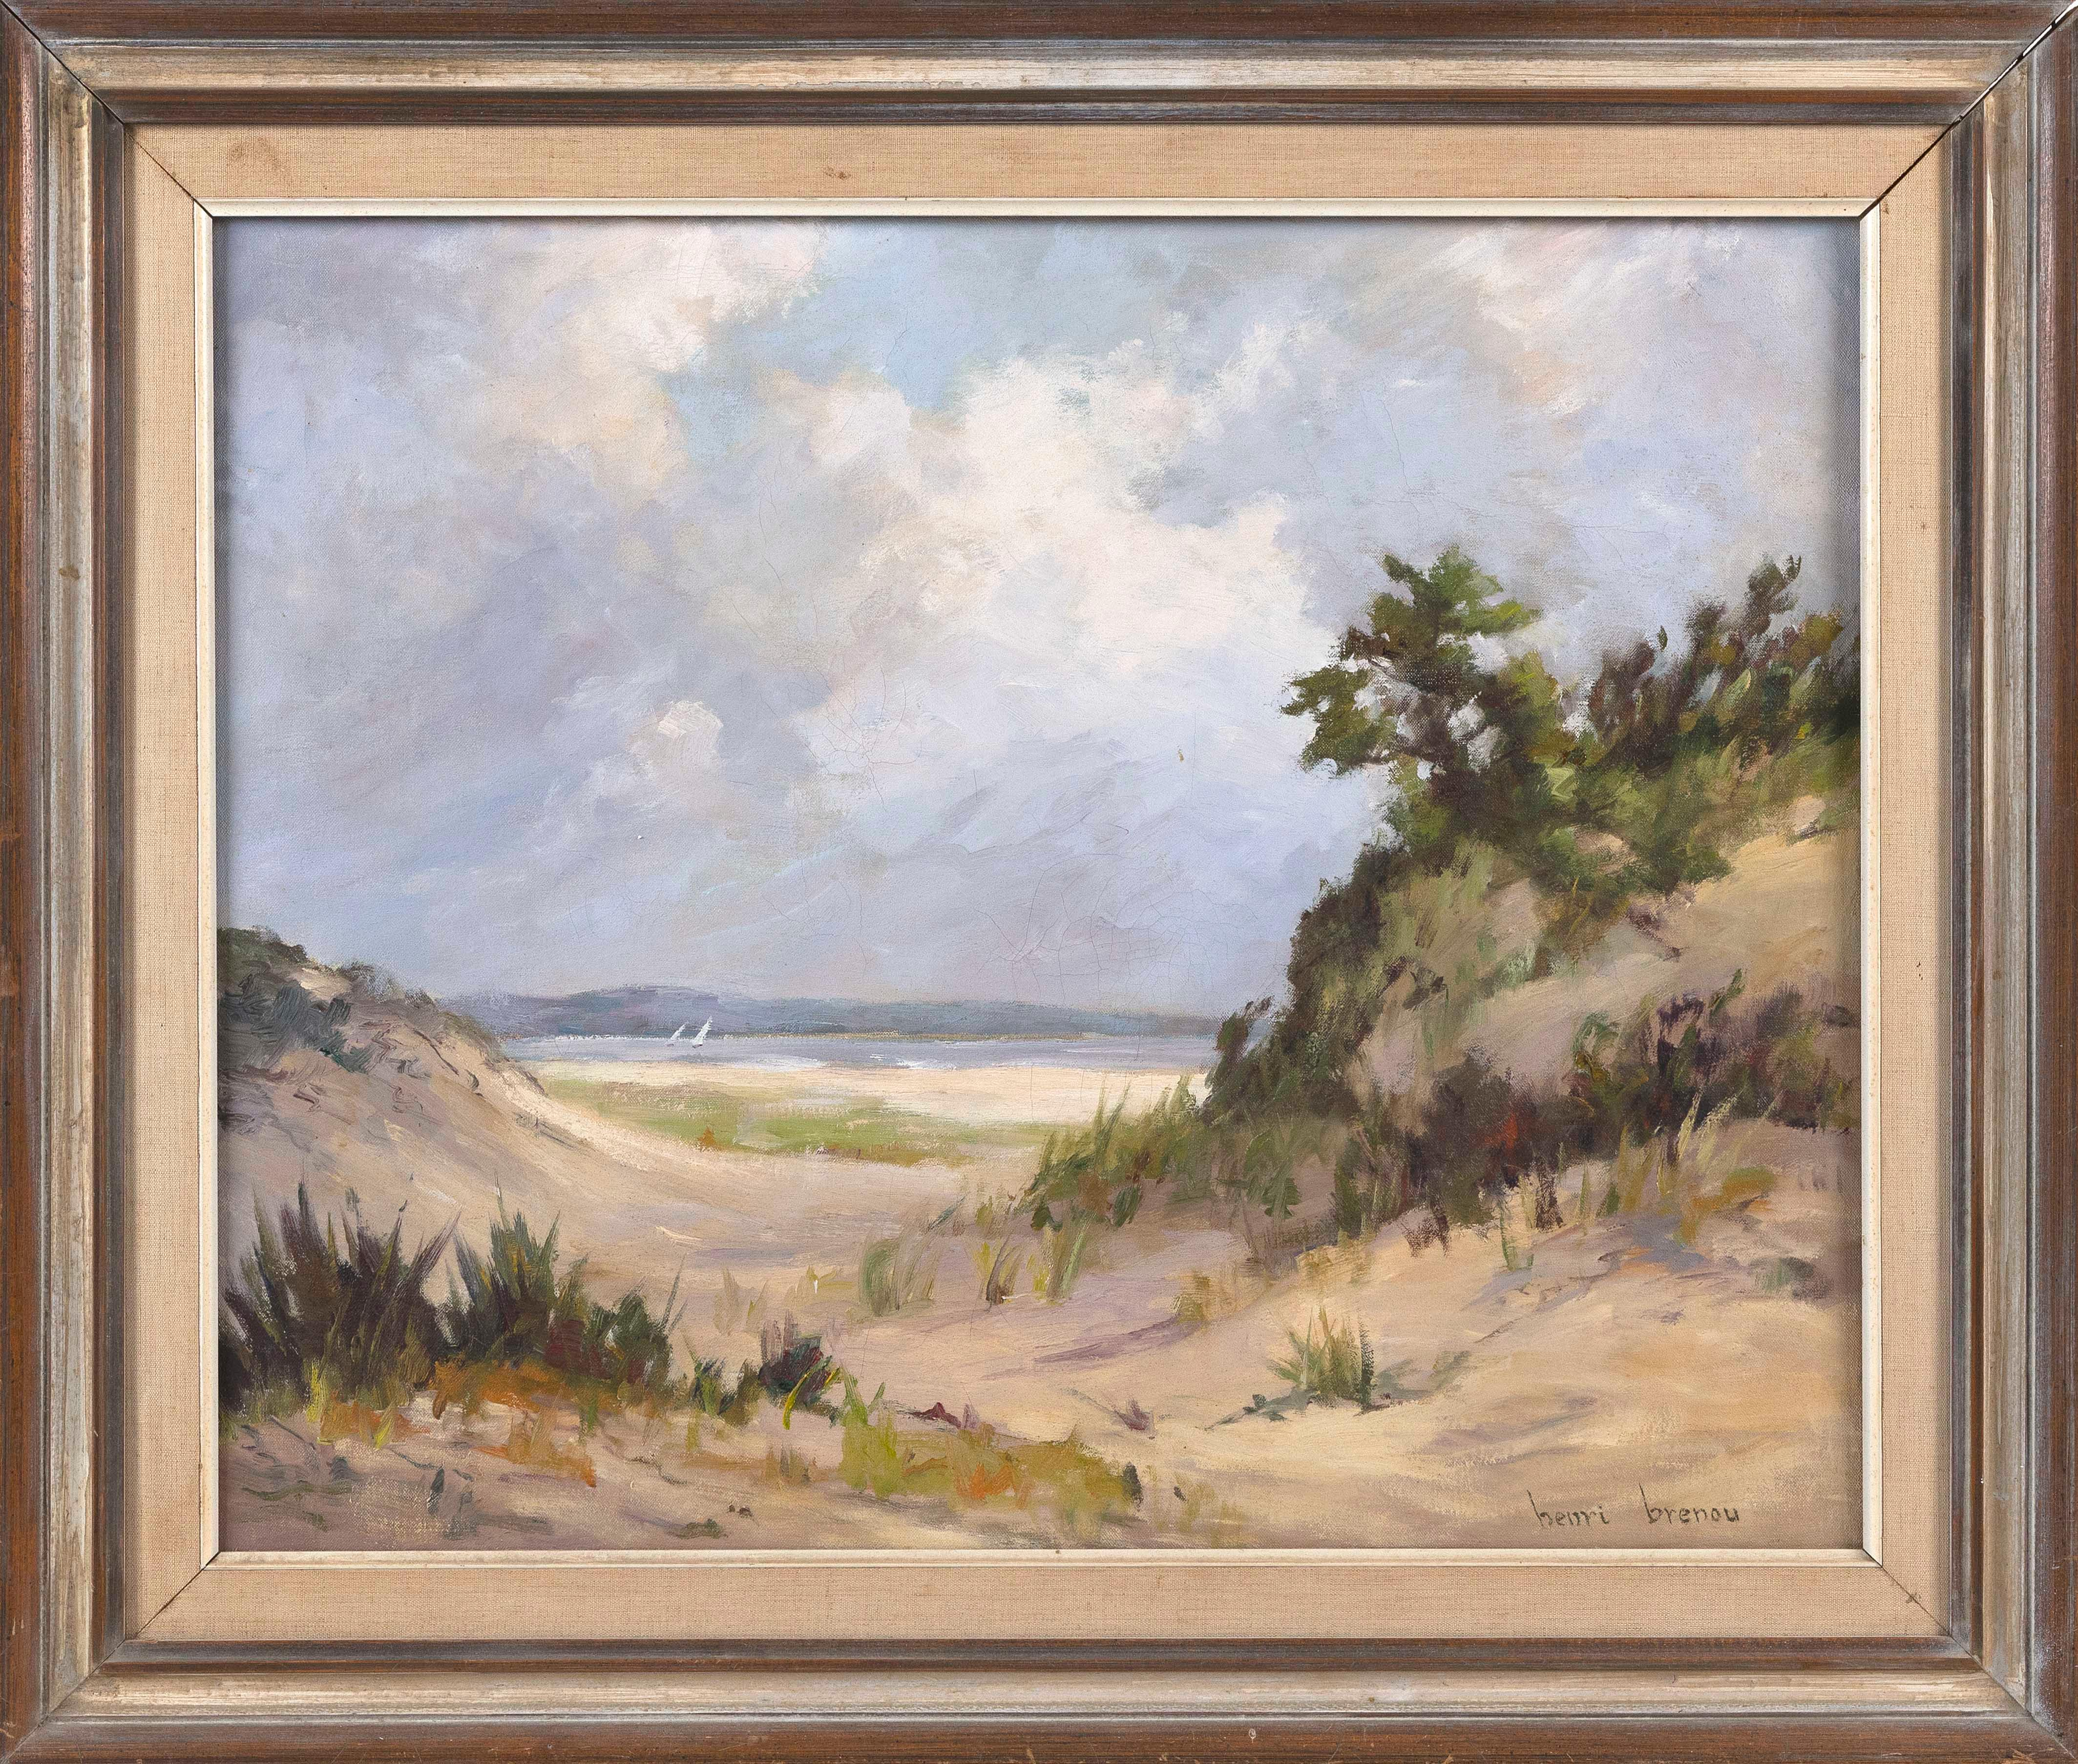 "HENRI BRENOU (Massachusetts, 1904-1976), Cape Cod landscape., Oil on canvas, 22"" x 27"". Framed 28"" x 32""."